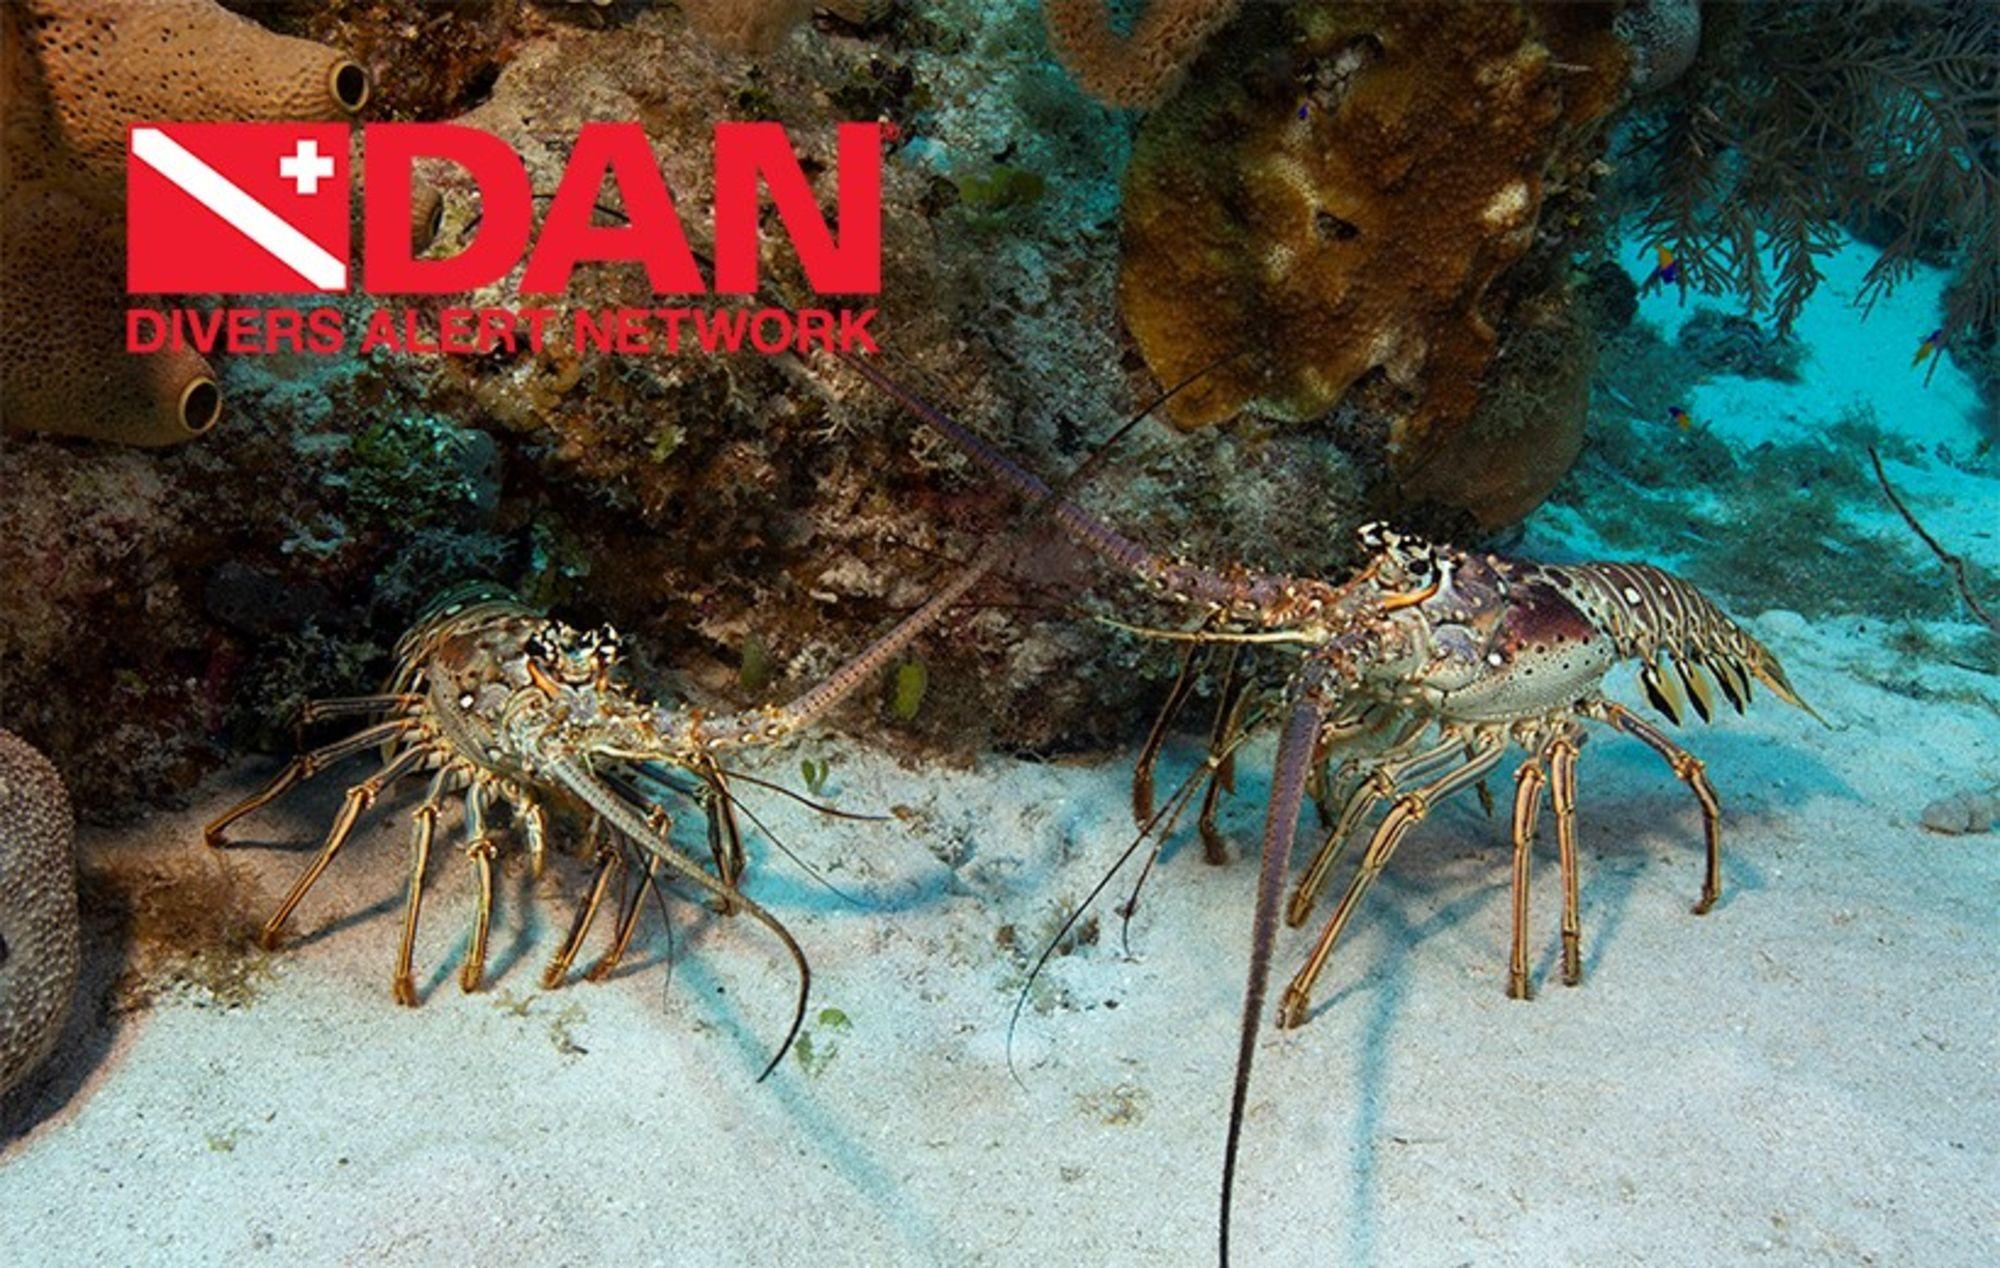 DAN Encourages Divers to Enjoy Lobster Mini Season Safely